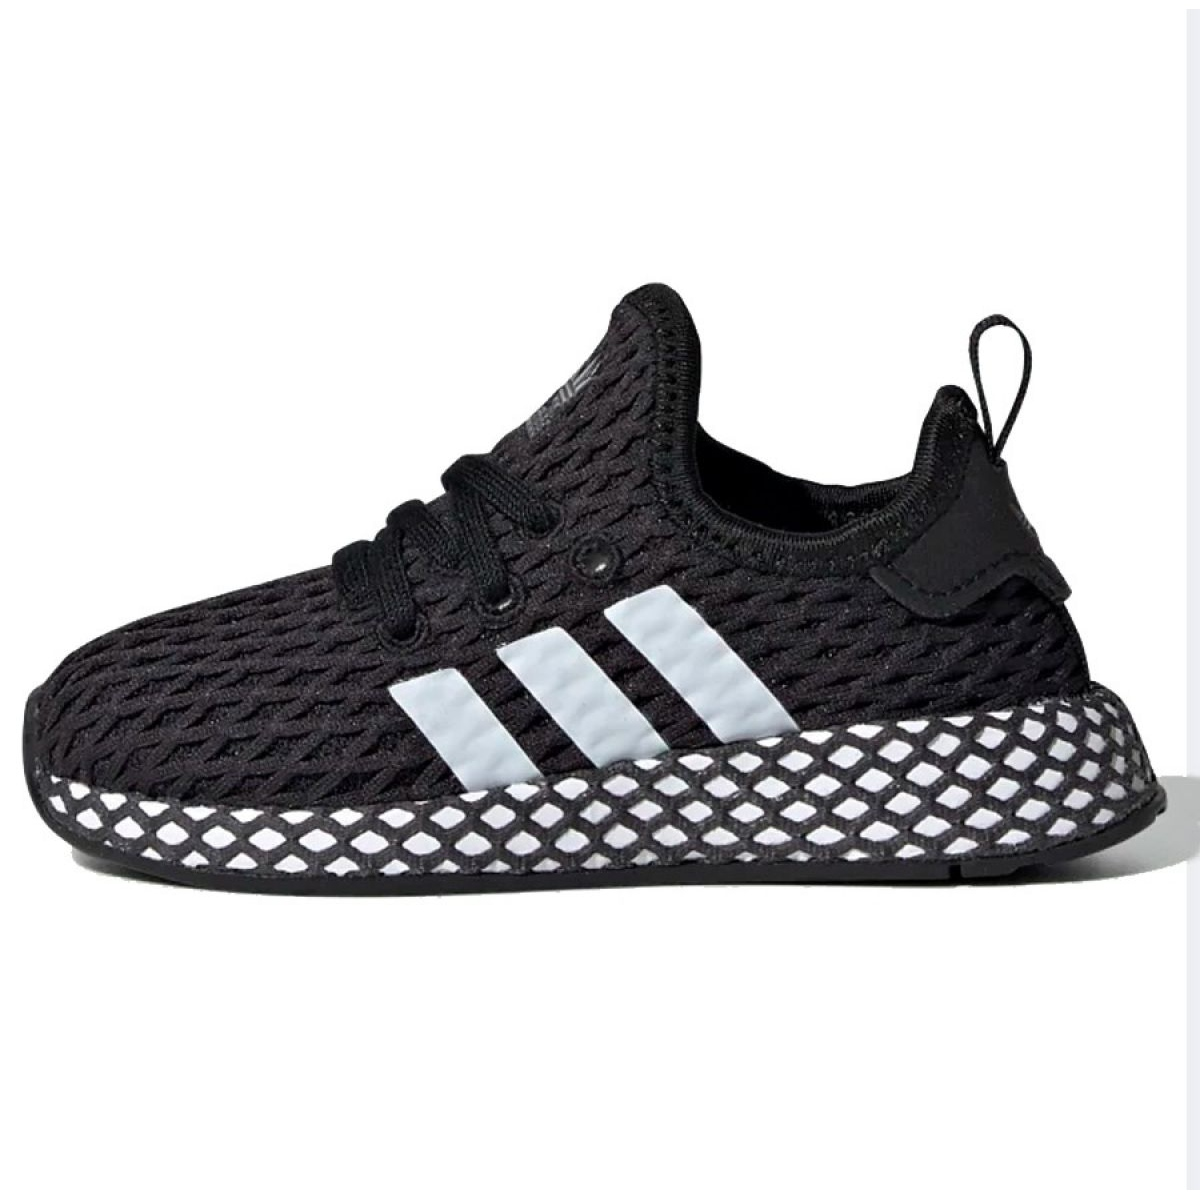 Adidas Originals Deerupt Runner Jr